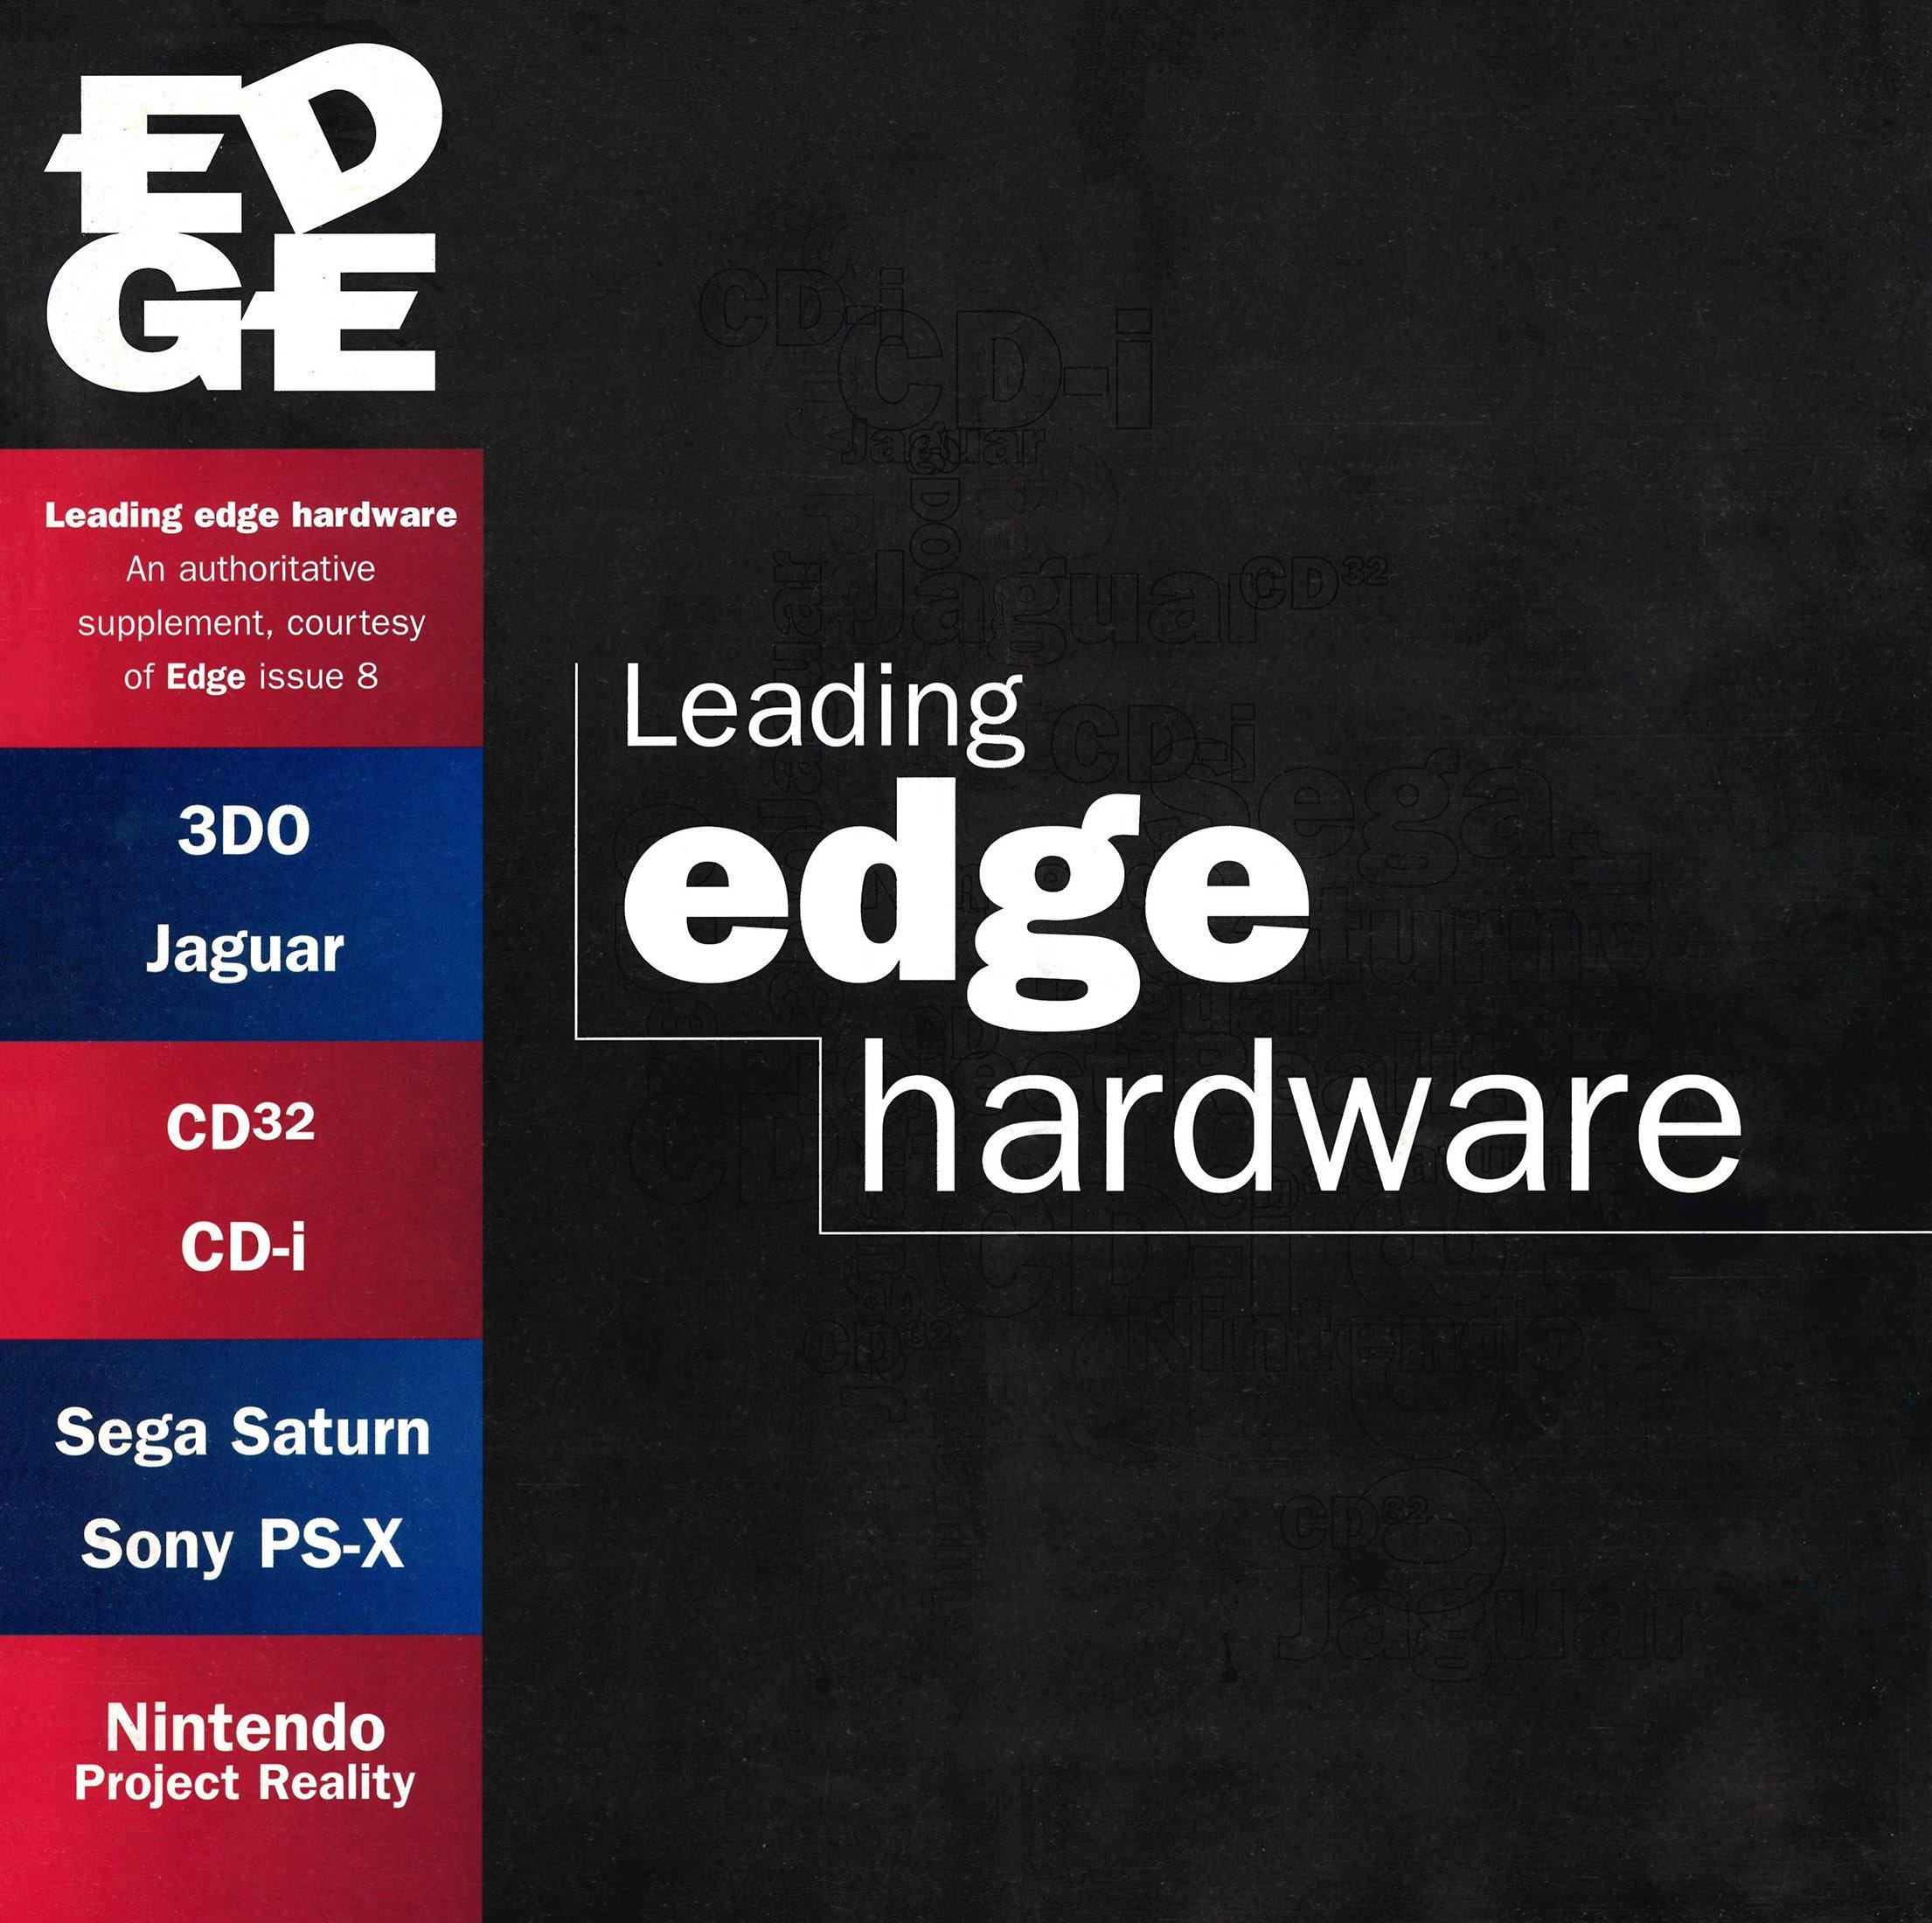 Edge Issue 8 Supplement - Leading edge hardware (1994)